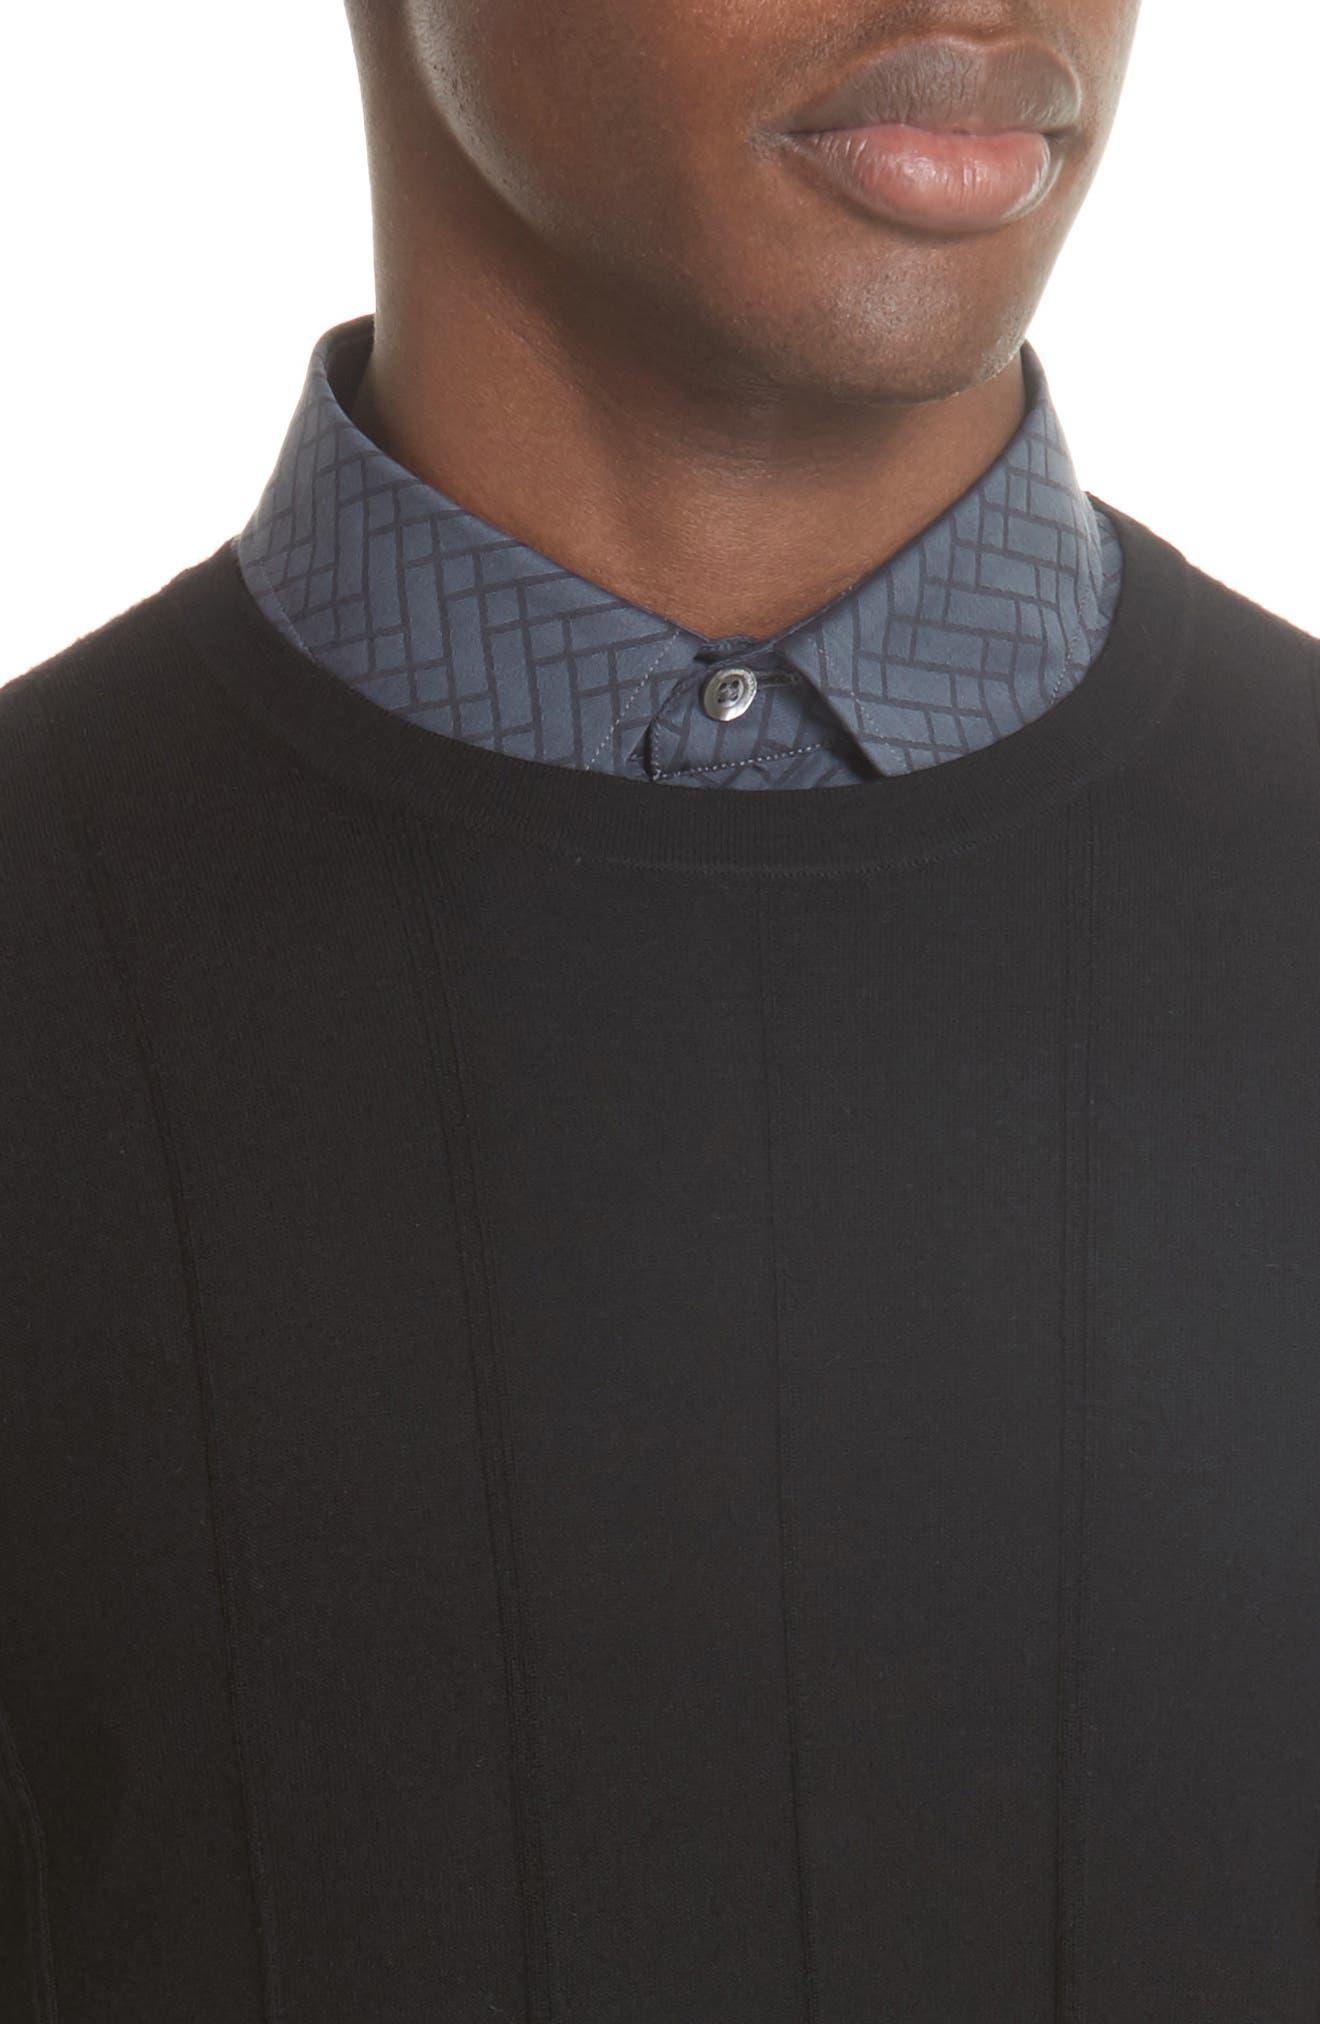 Crewneck Wool Sweater,                             Alternate thumbnail 4, color,                             BLACK